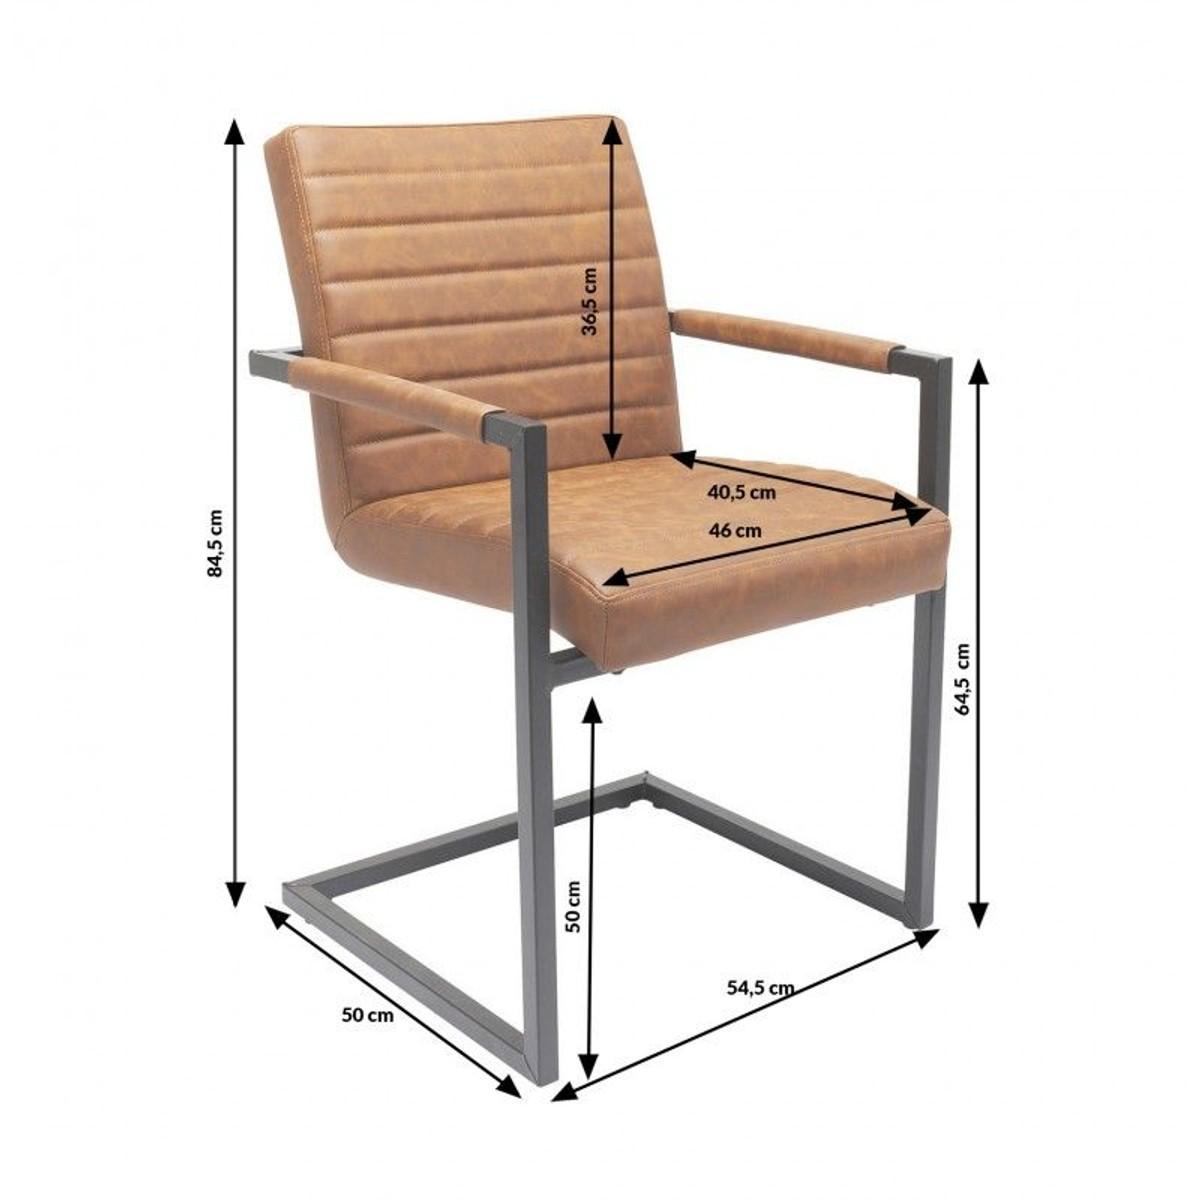 Chaise Avec Accoudoirs Cantilever Barone Marron Kare Design Taille Tu Chaise Chaise Design Chaise Accoudoir